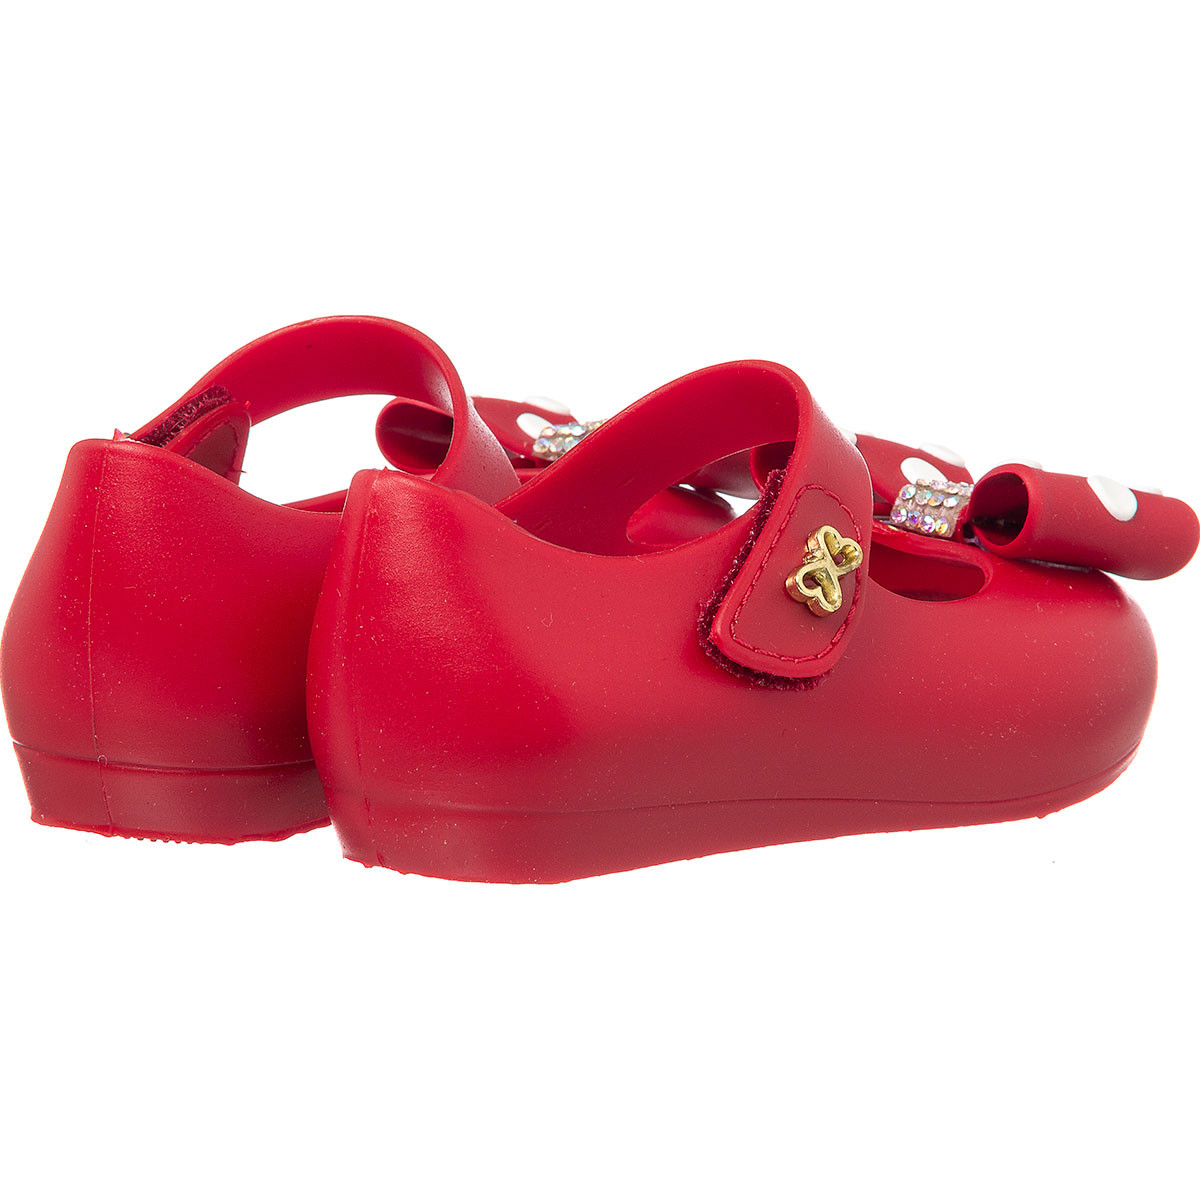 Sapatilha World Colors Vermelho Feminino 067.026